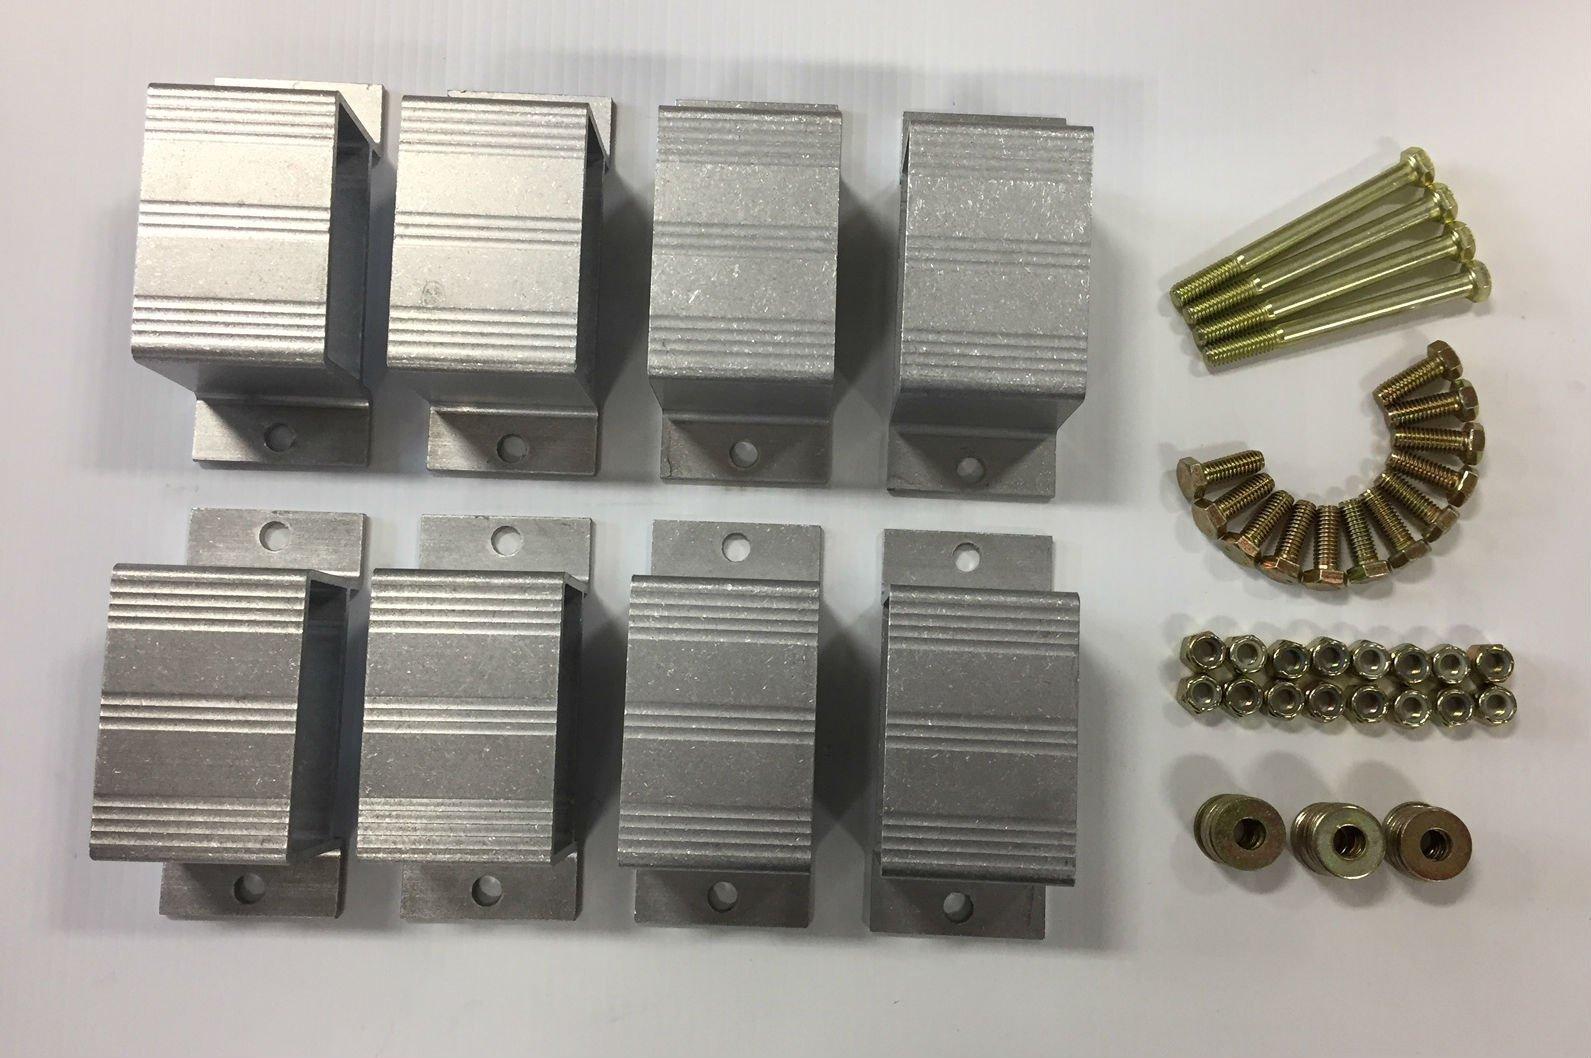 Triton 08535 ATV Trailer Stake Pocket Kit with 8 Pockets by Triton